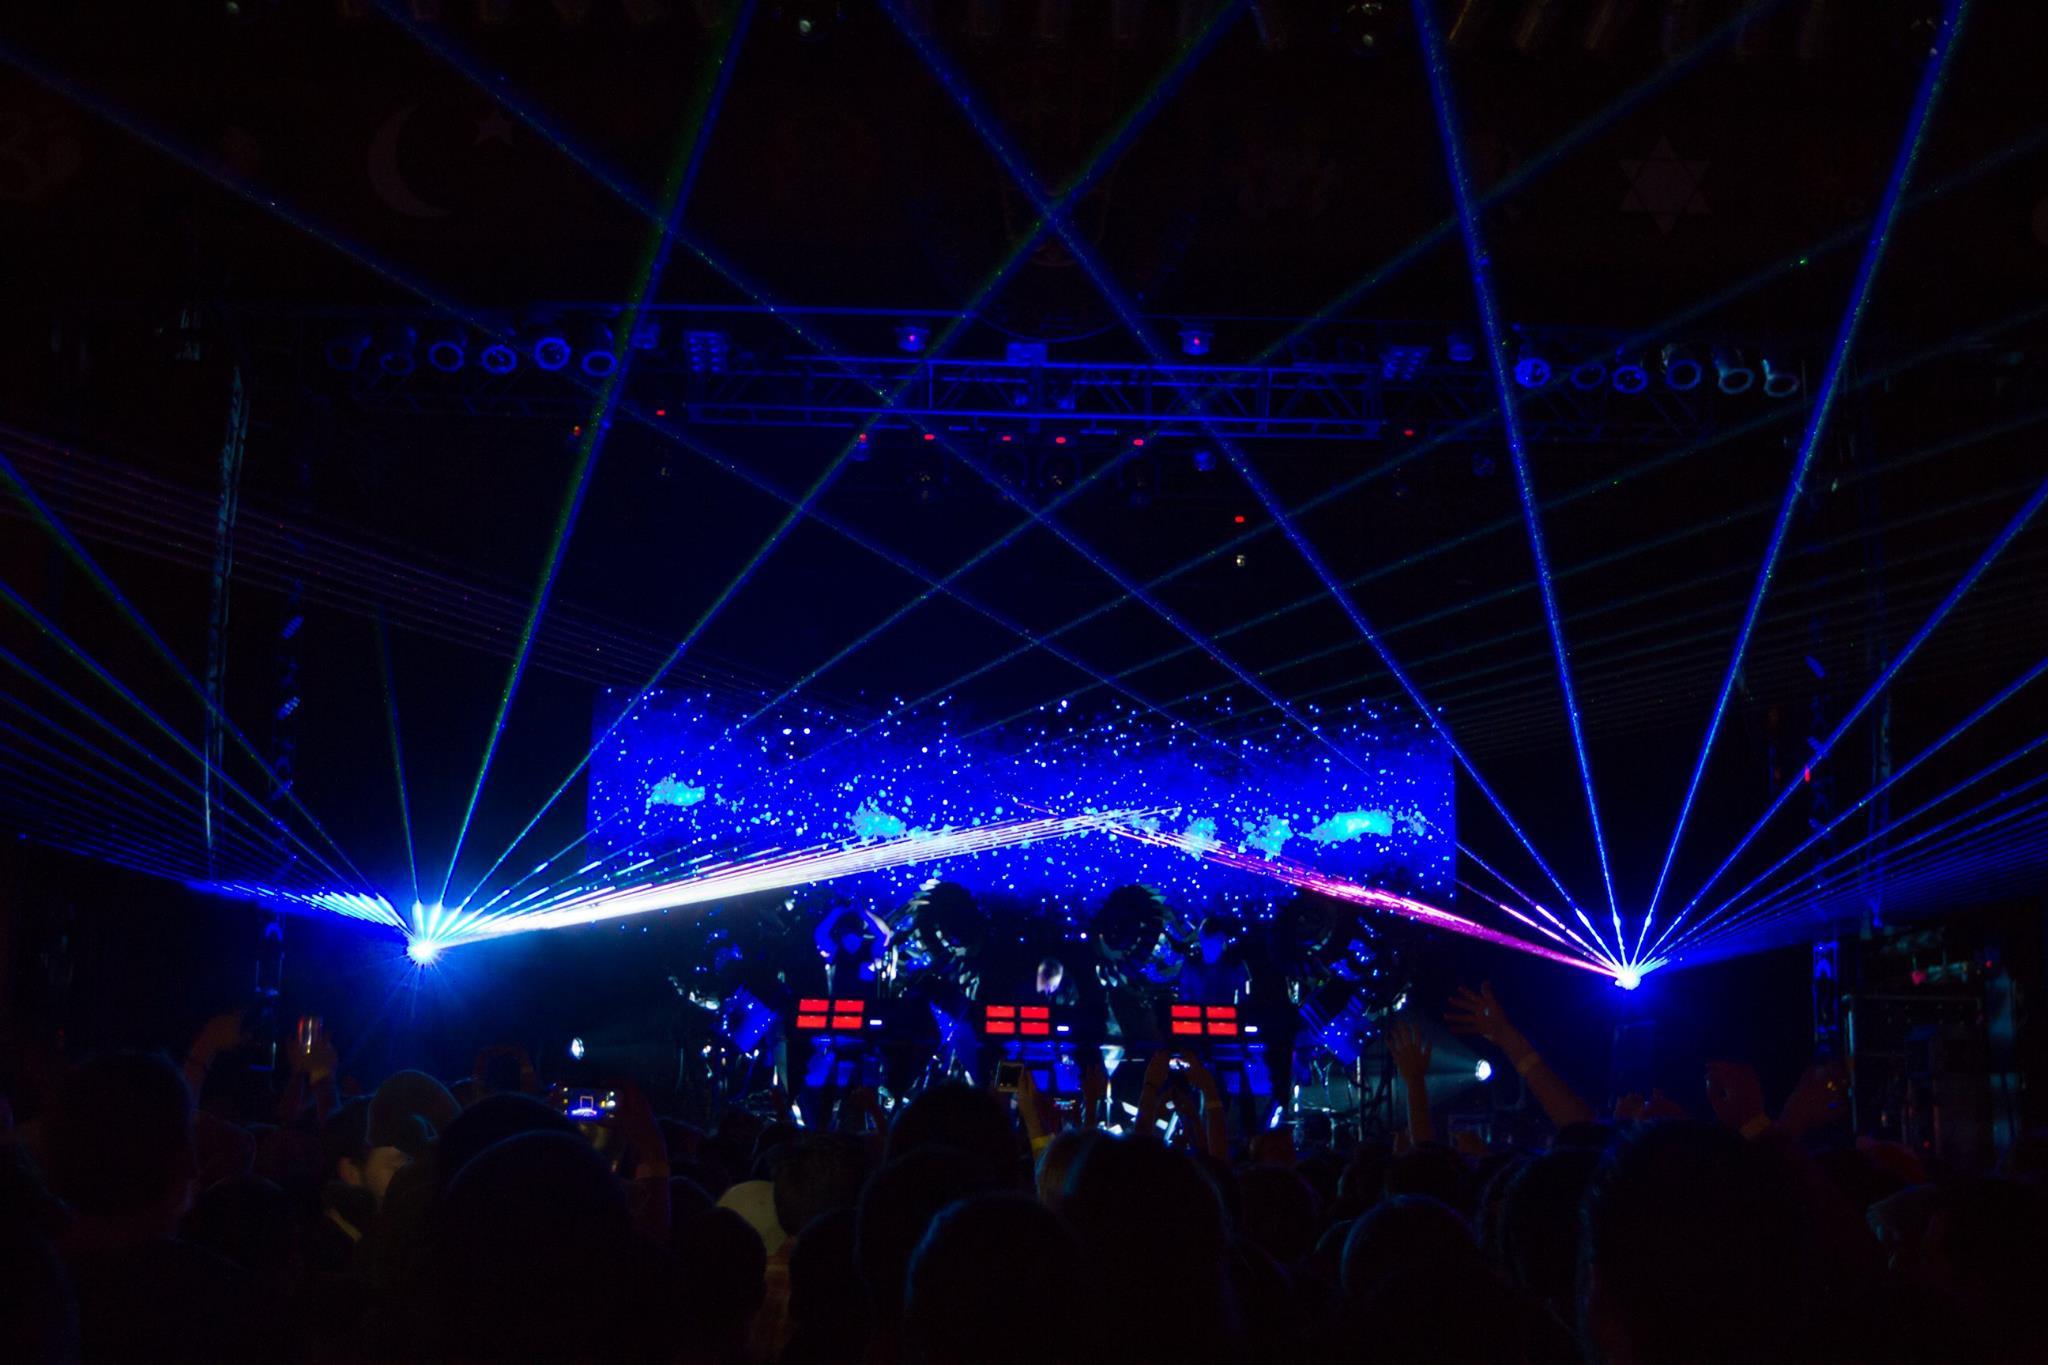 GLITCH MOB Lasers